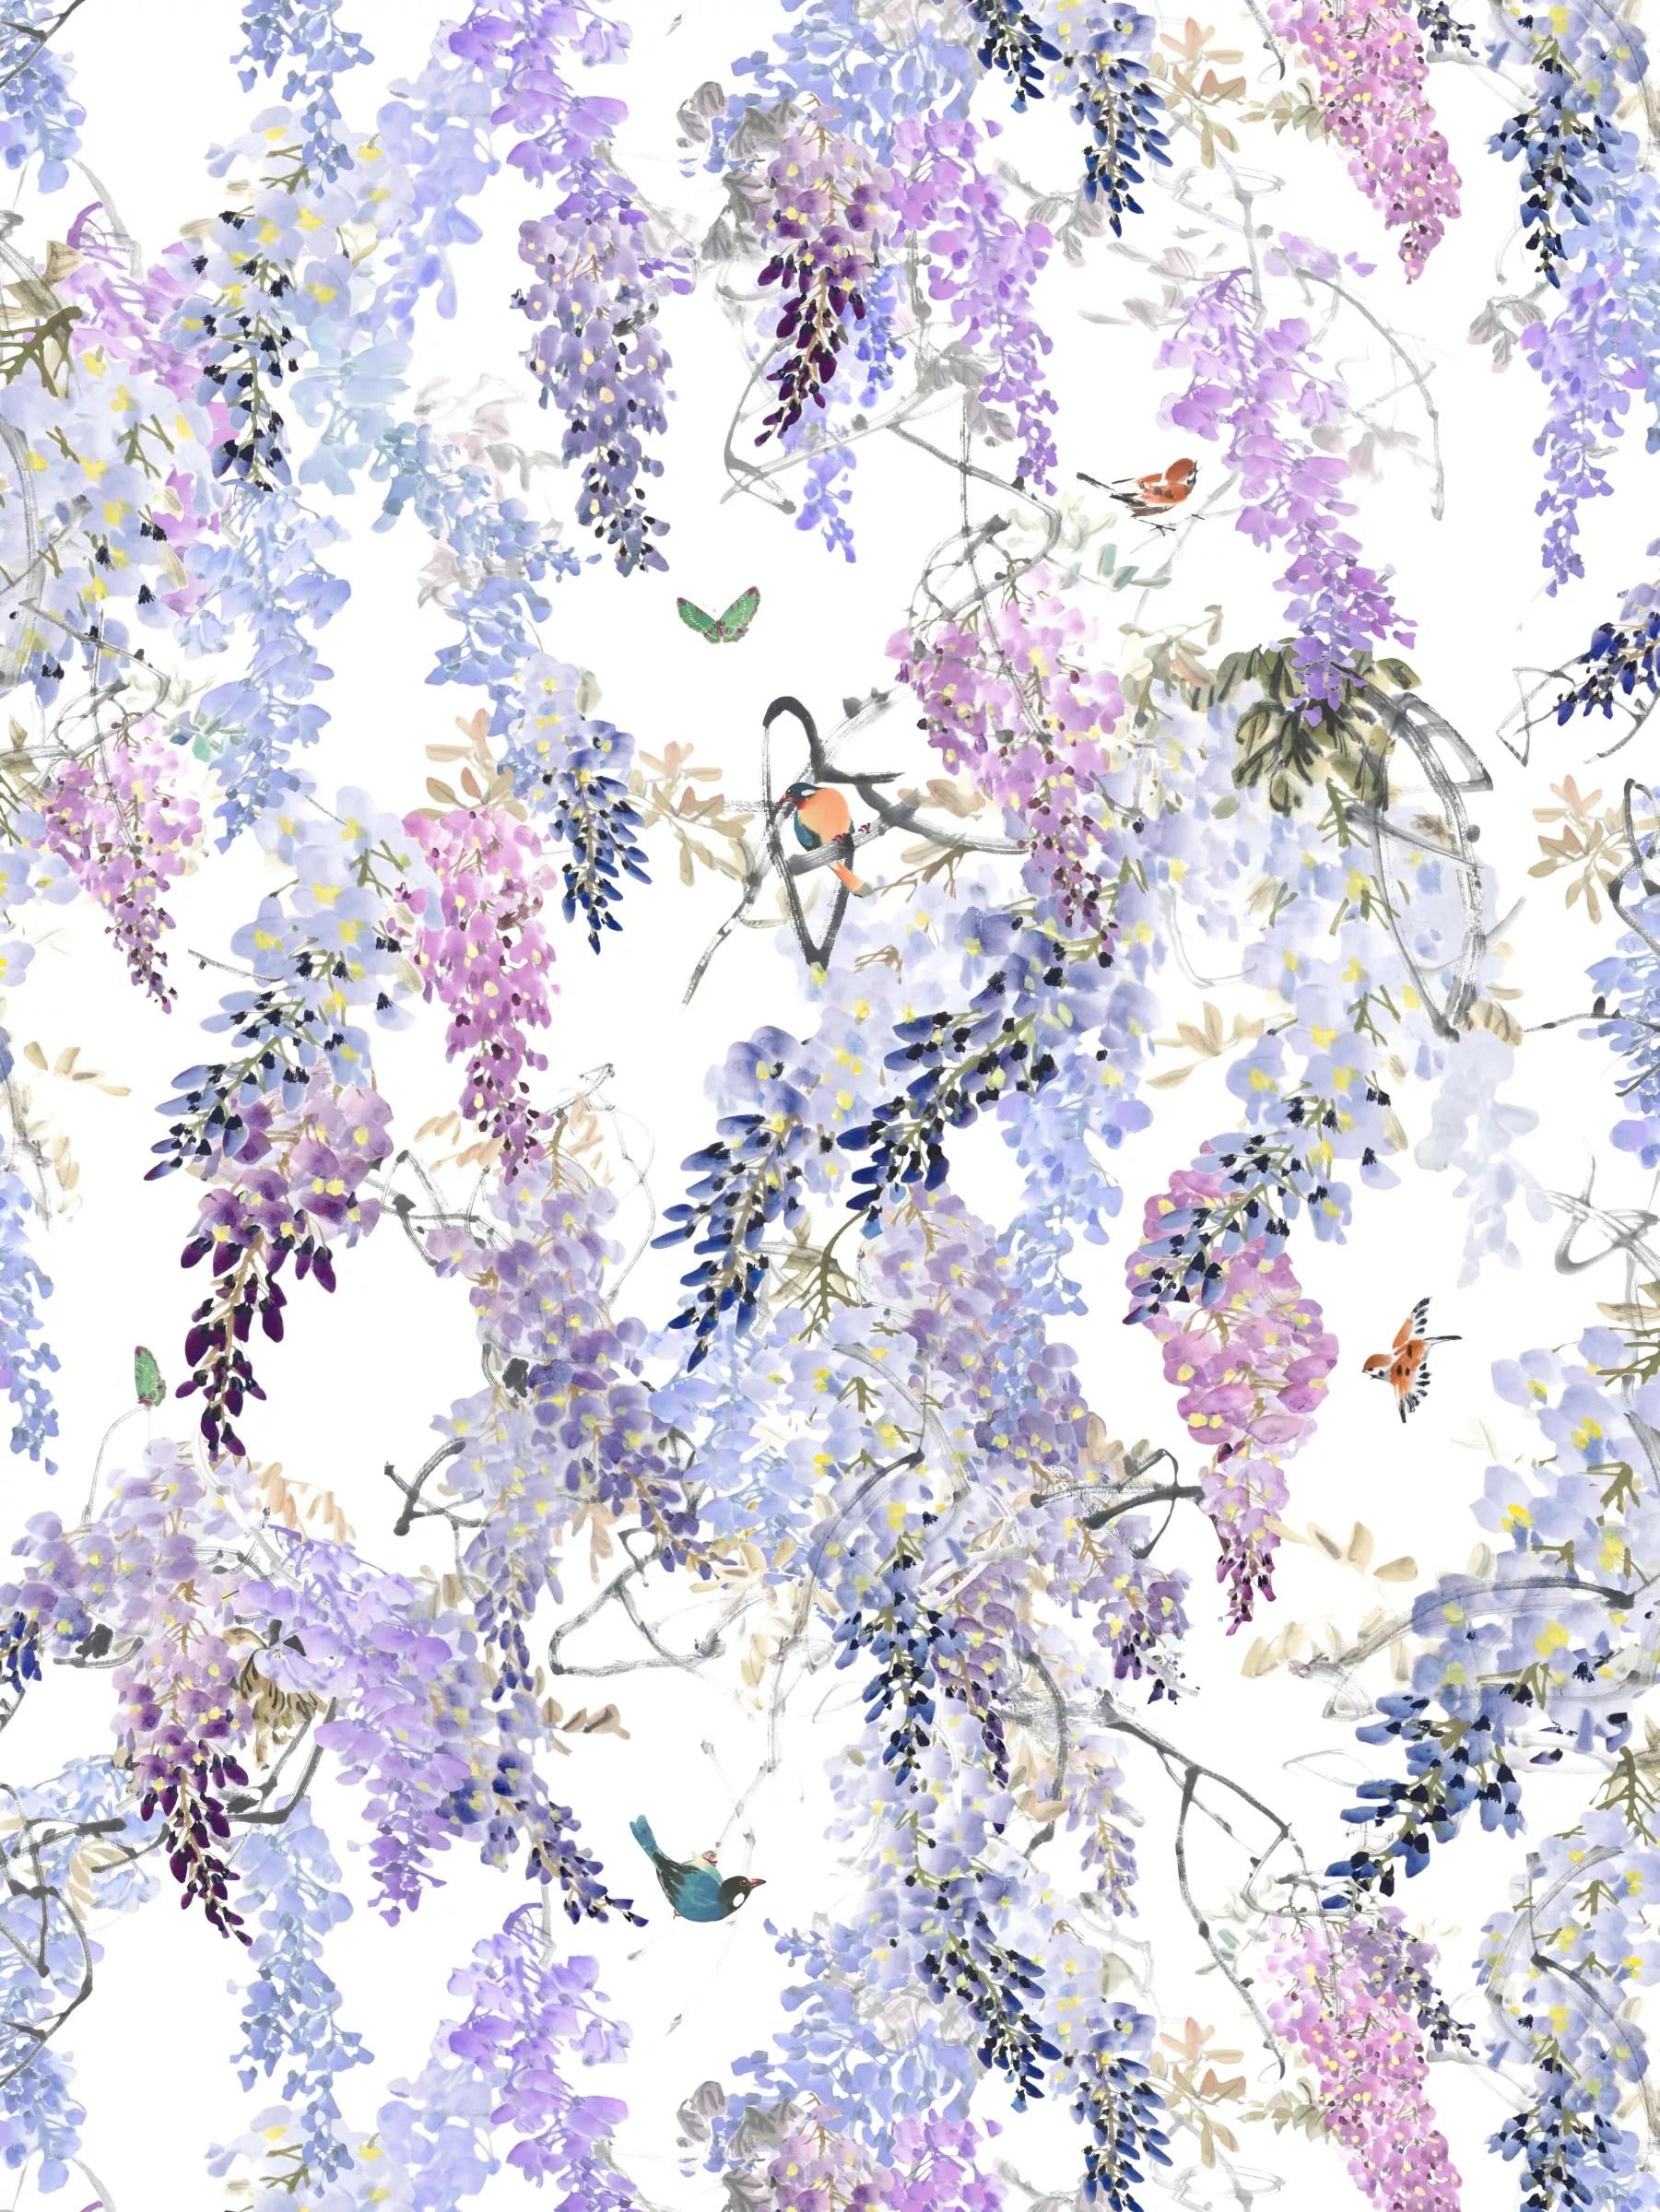 Wisteria Falls Wallpaper Buy Sanderson Waterperry Wisteria Falls Wallpaper Lilac